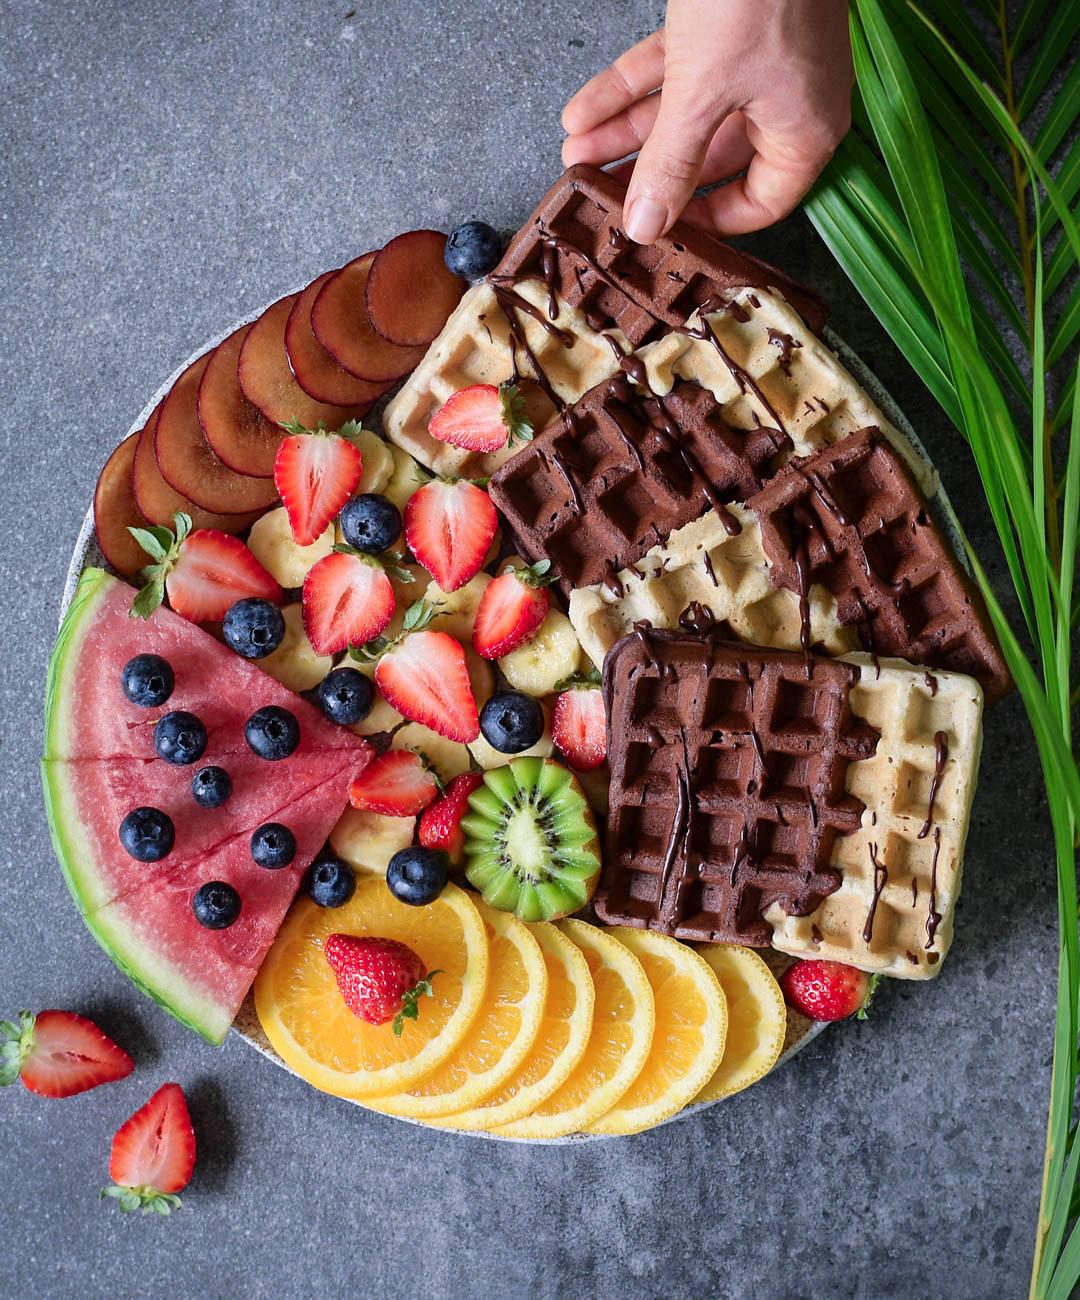 Healthy Vegan Waffles  Vegan gluten free waffles